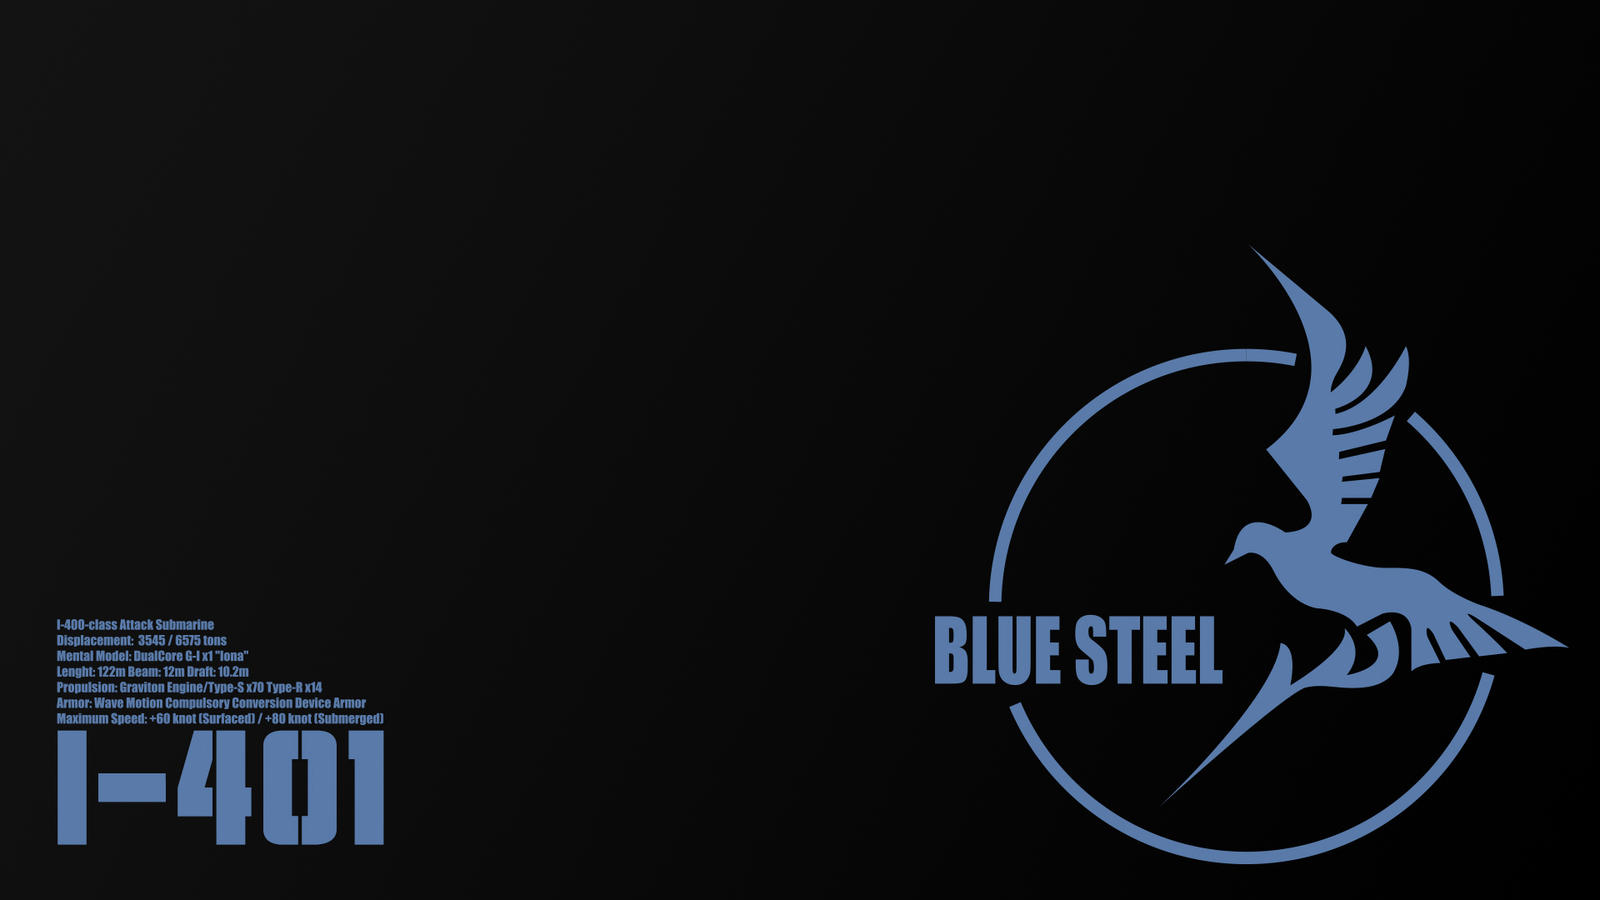 Arpeggio Of Blue Steel Ars Nova I 401 Wallpaper By